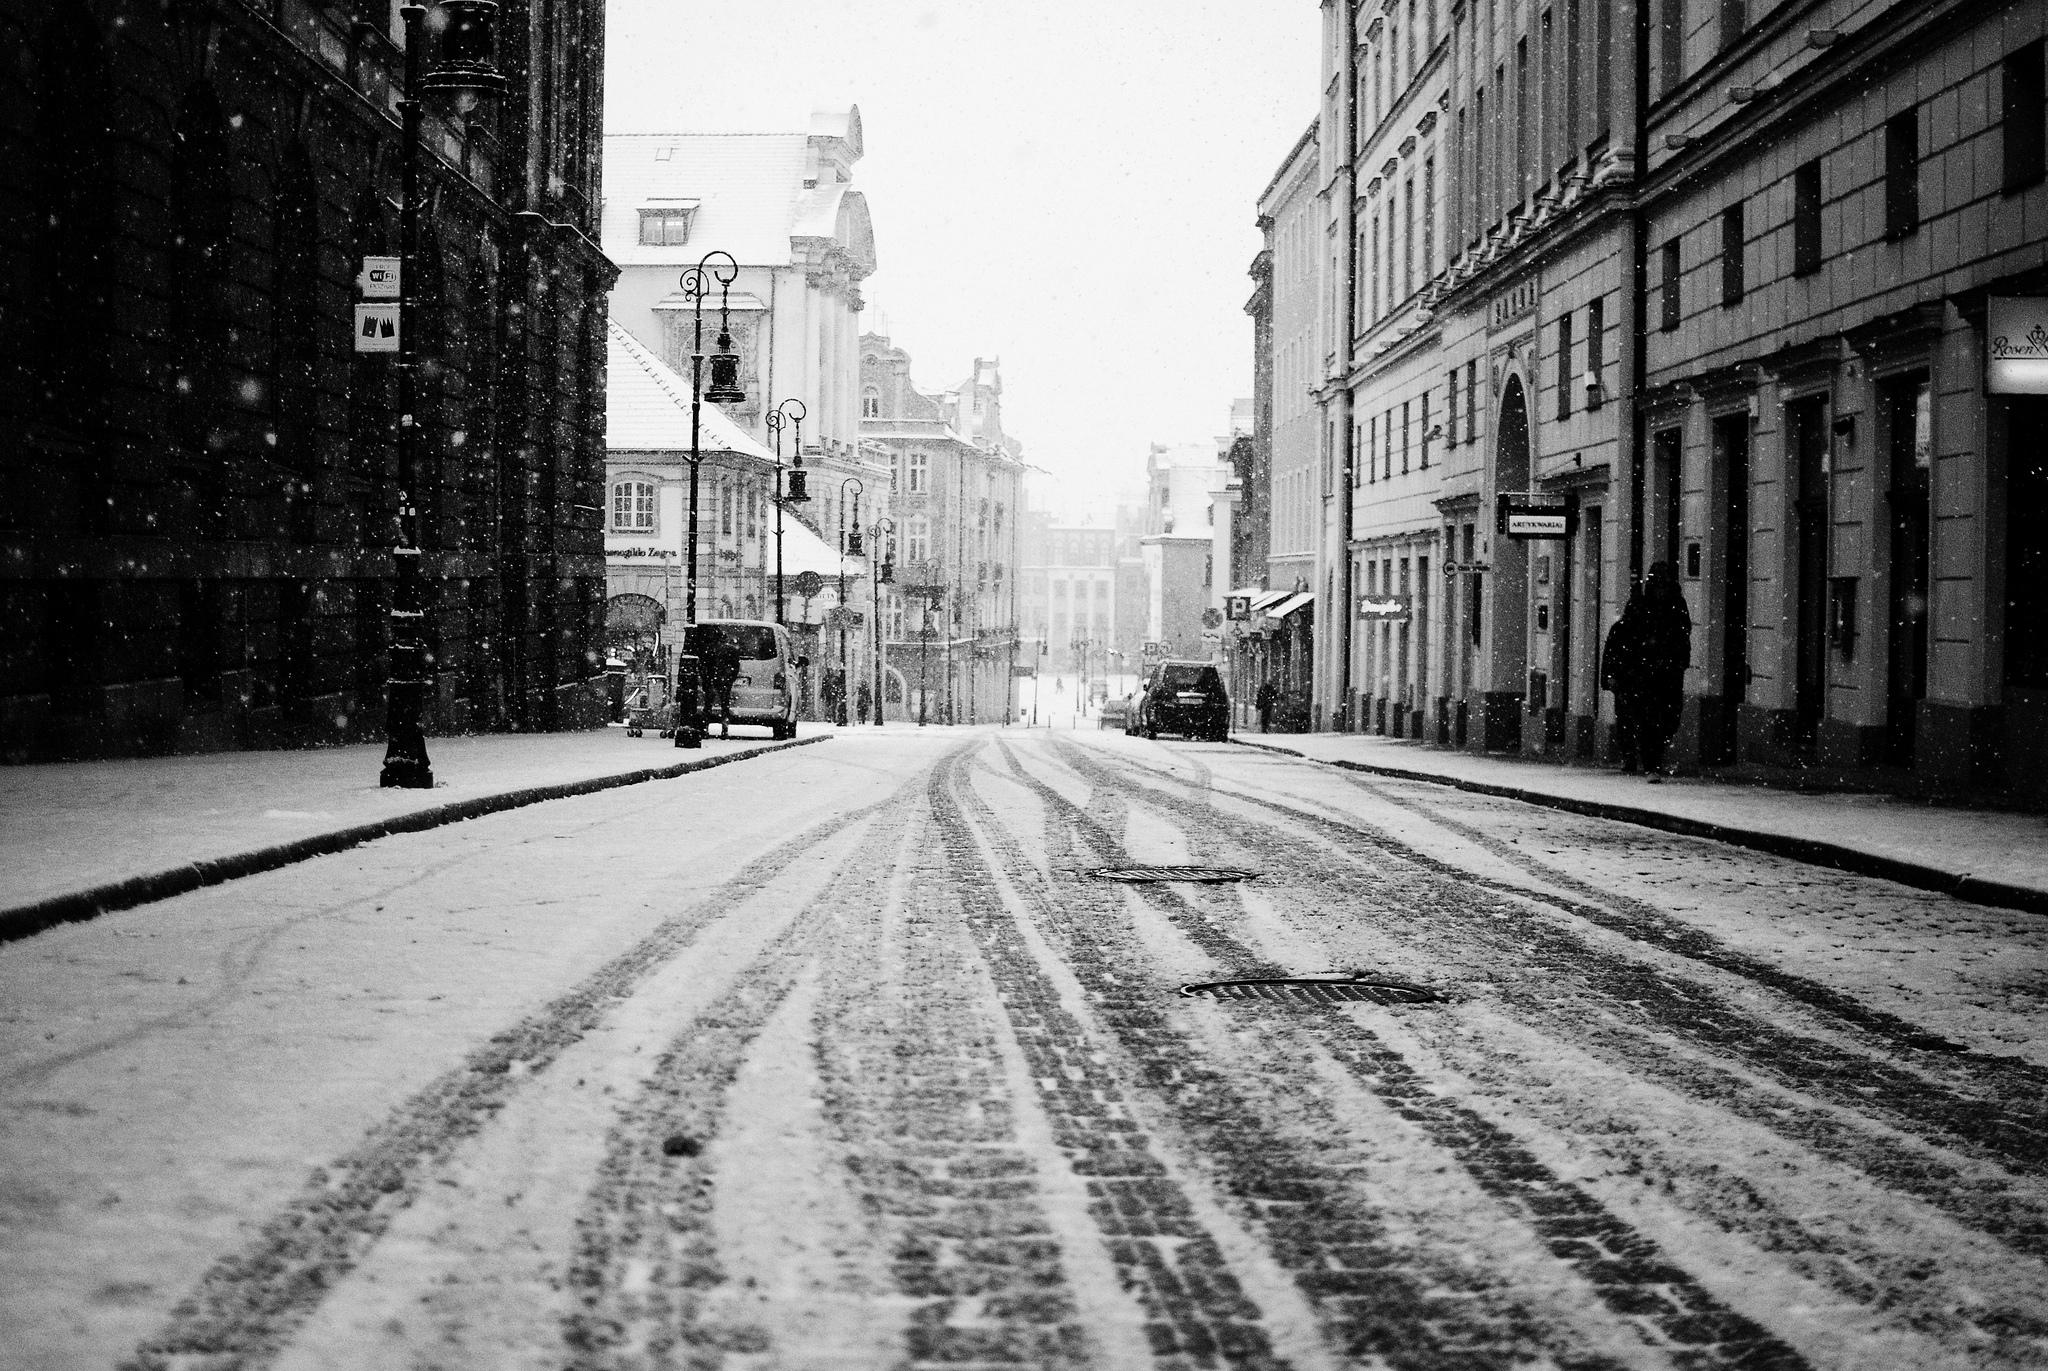 City road snow street buildings houses people cars tracks ...